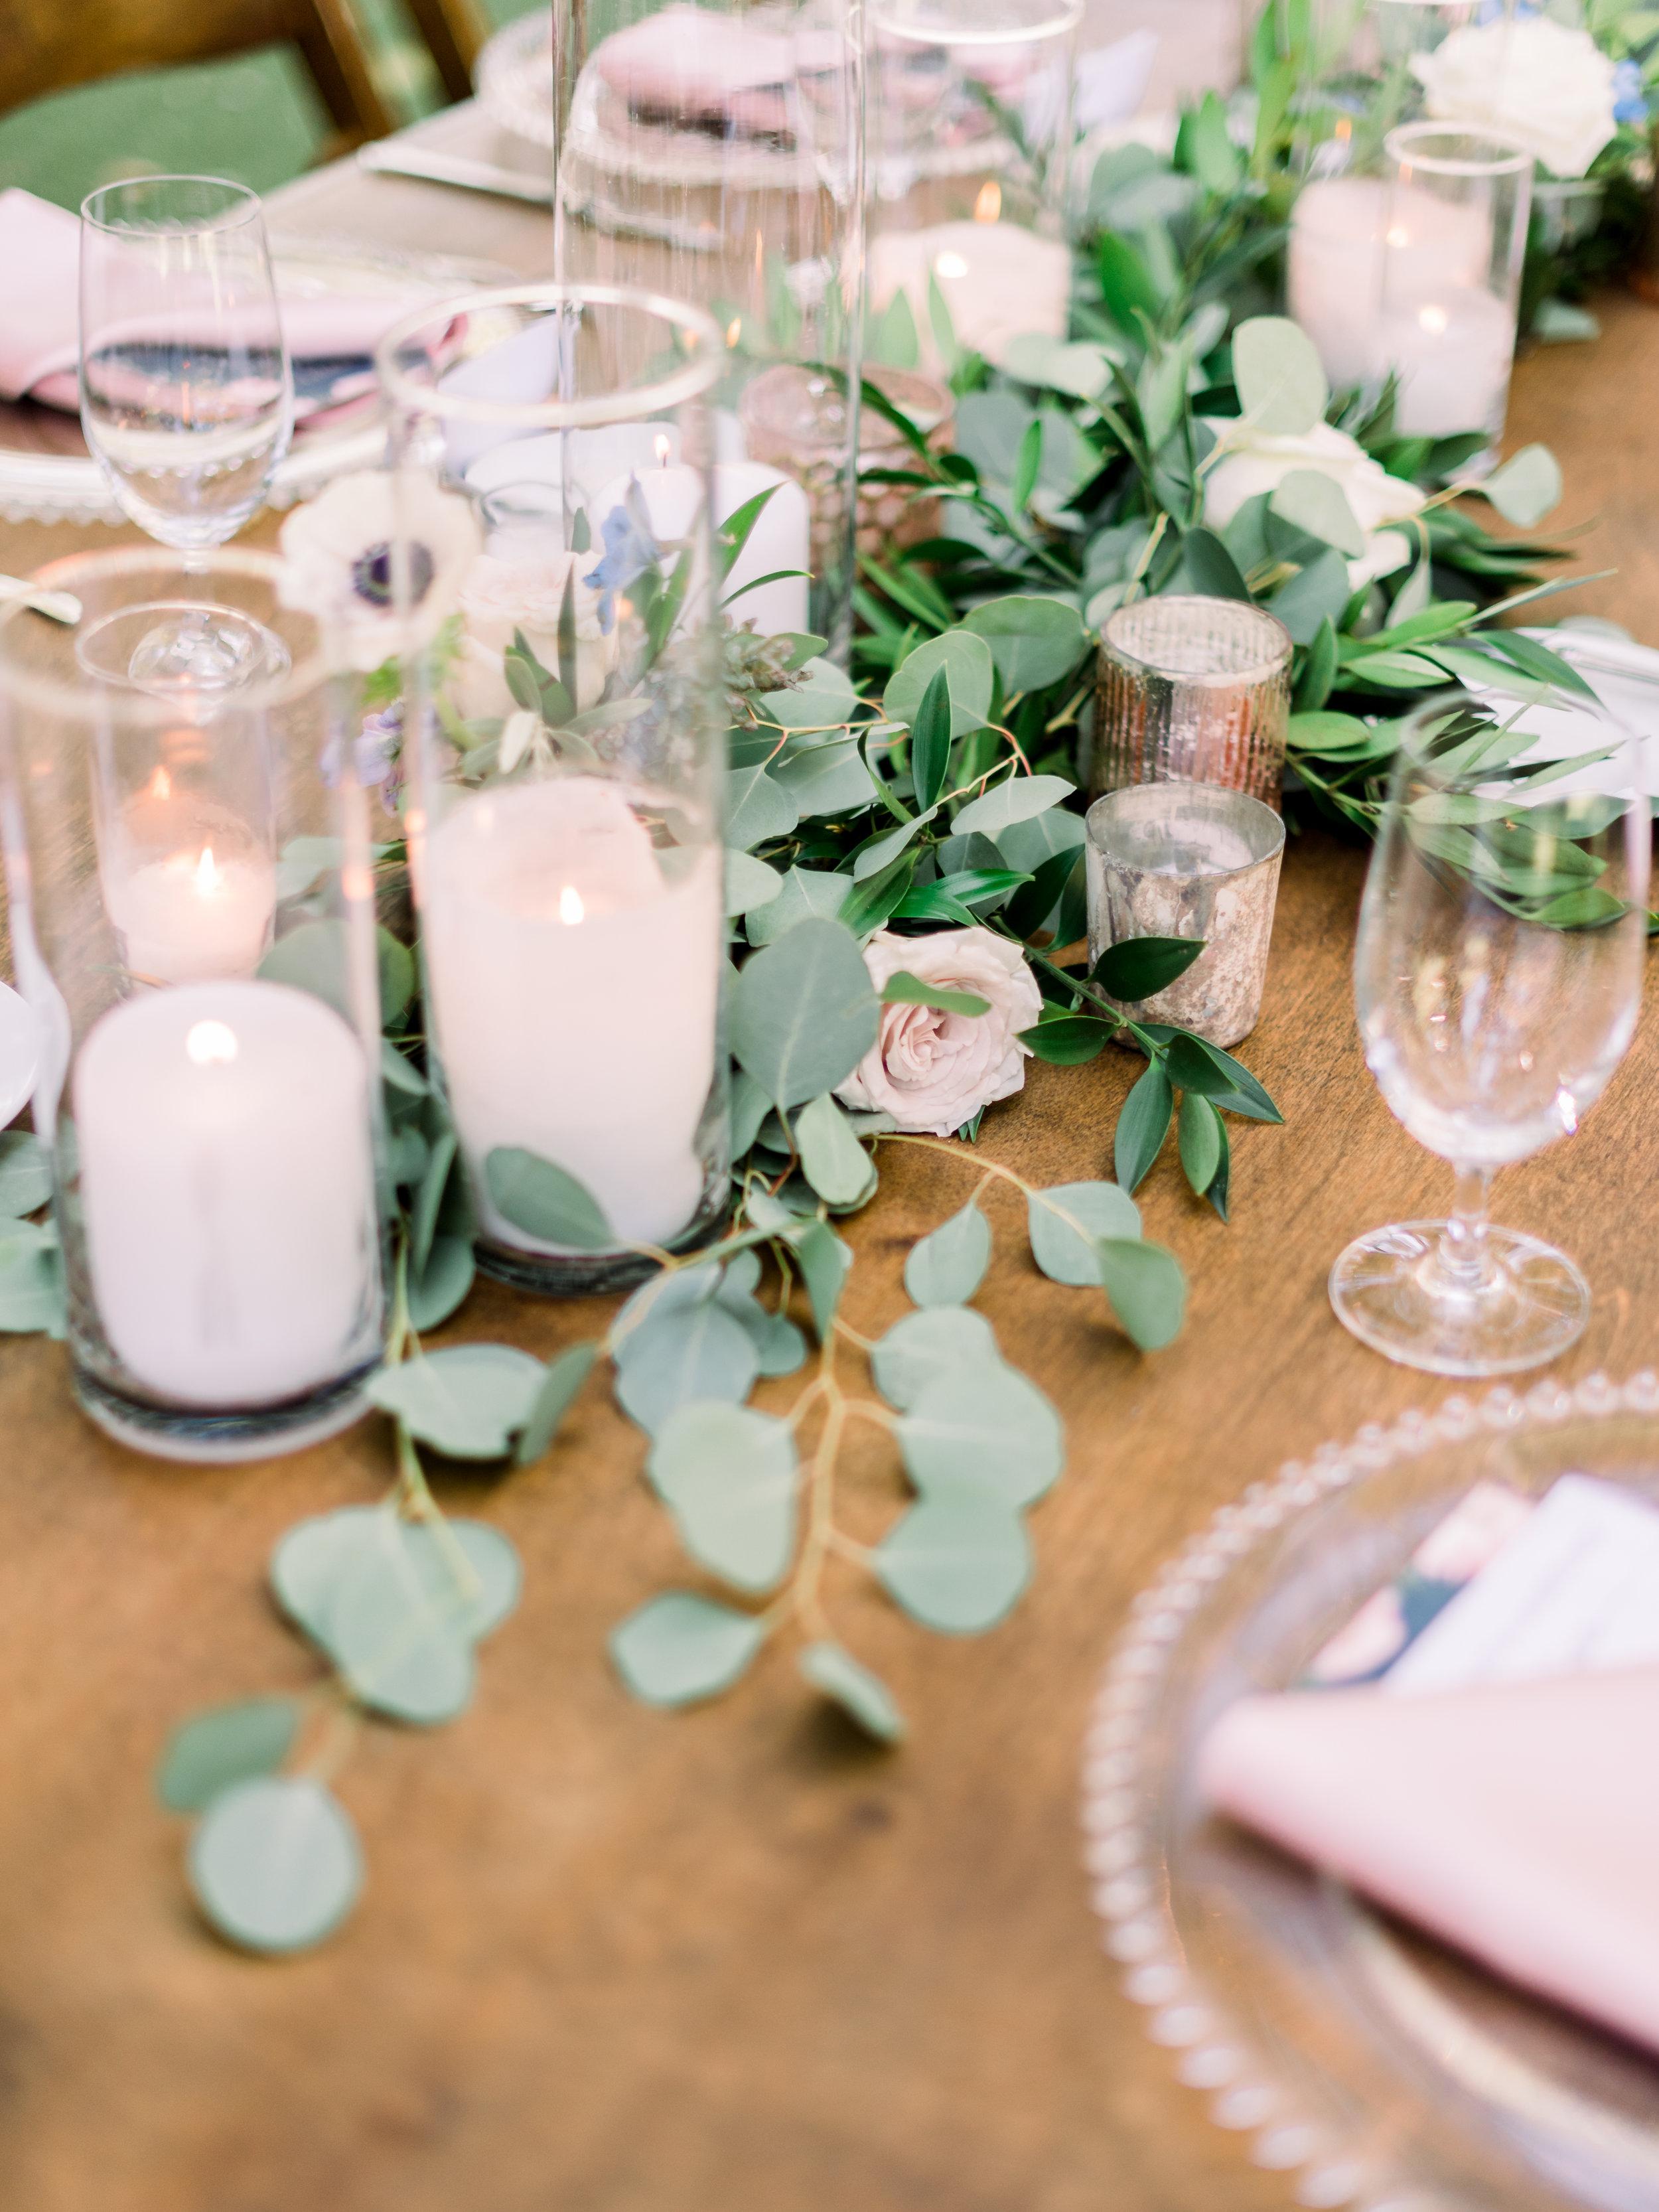 wedding-table-arrangement-with-floral-garland.jpg